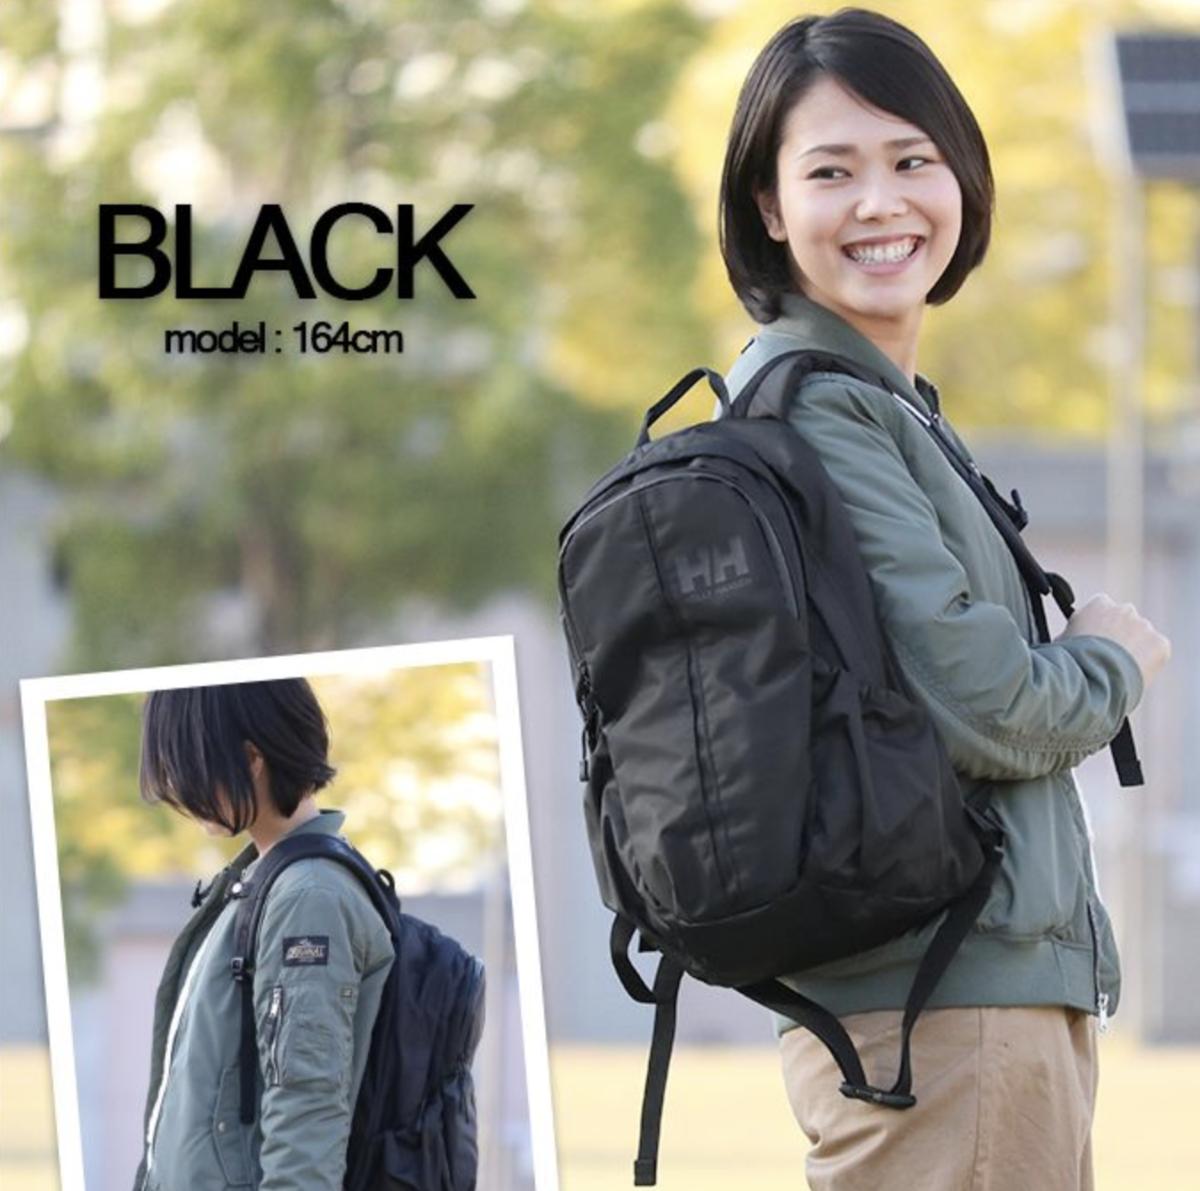 f:id:thebackpack:20190518140010p:plain